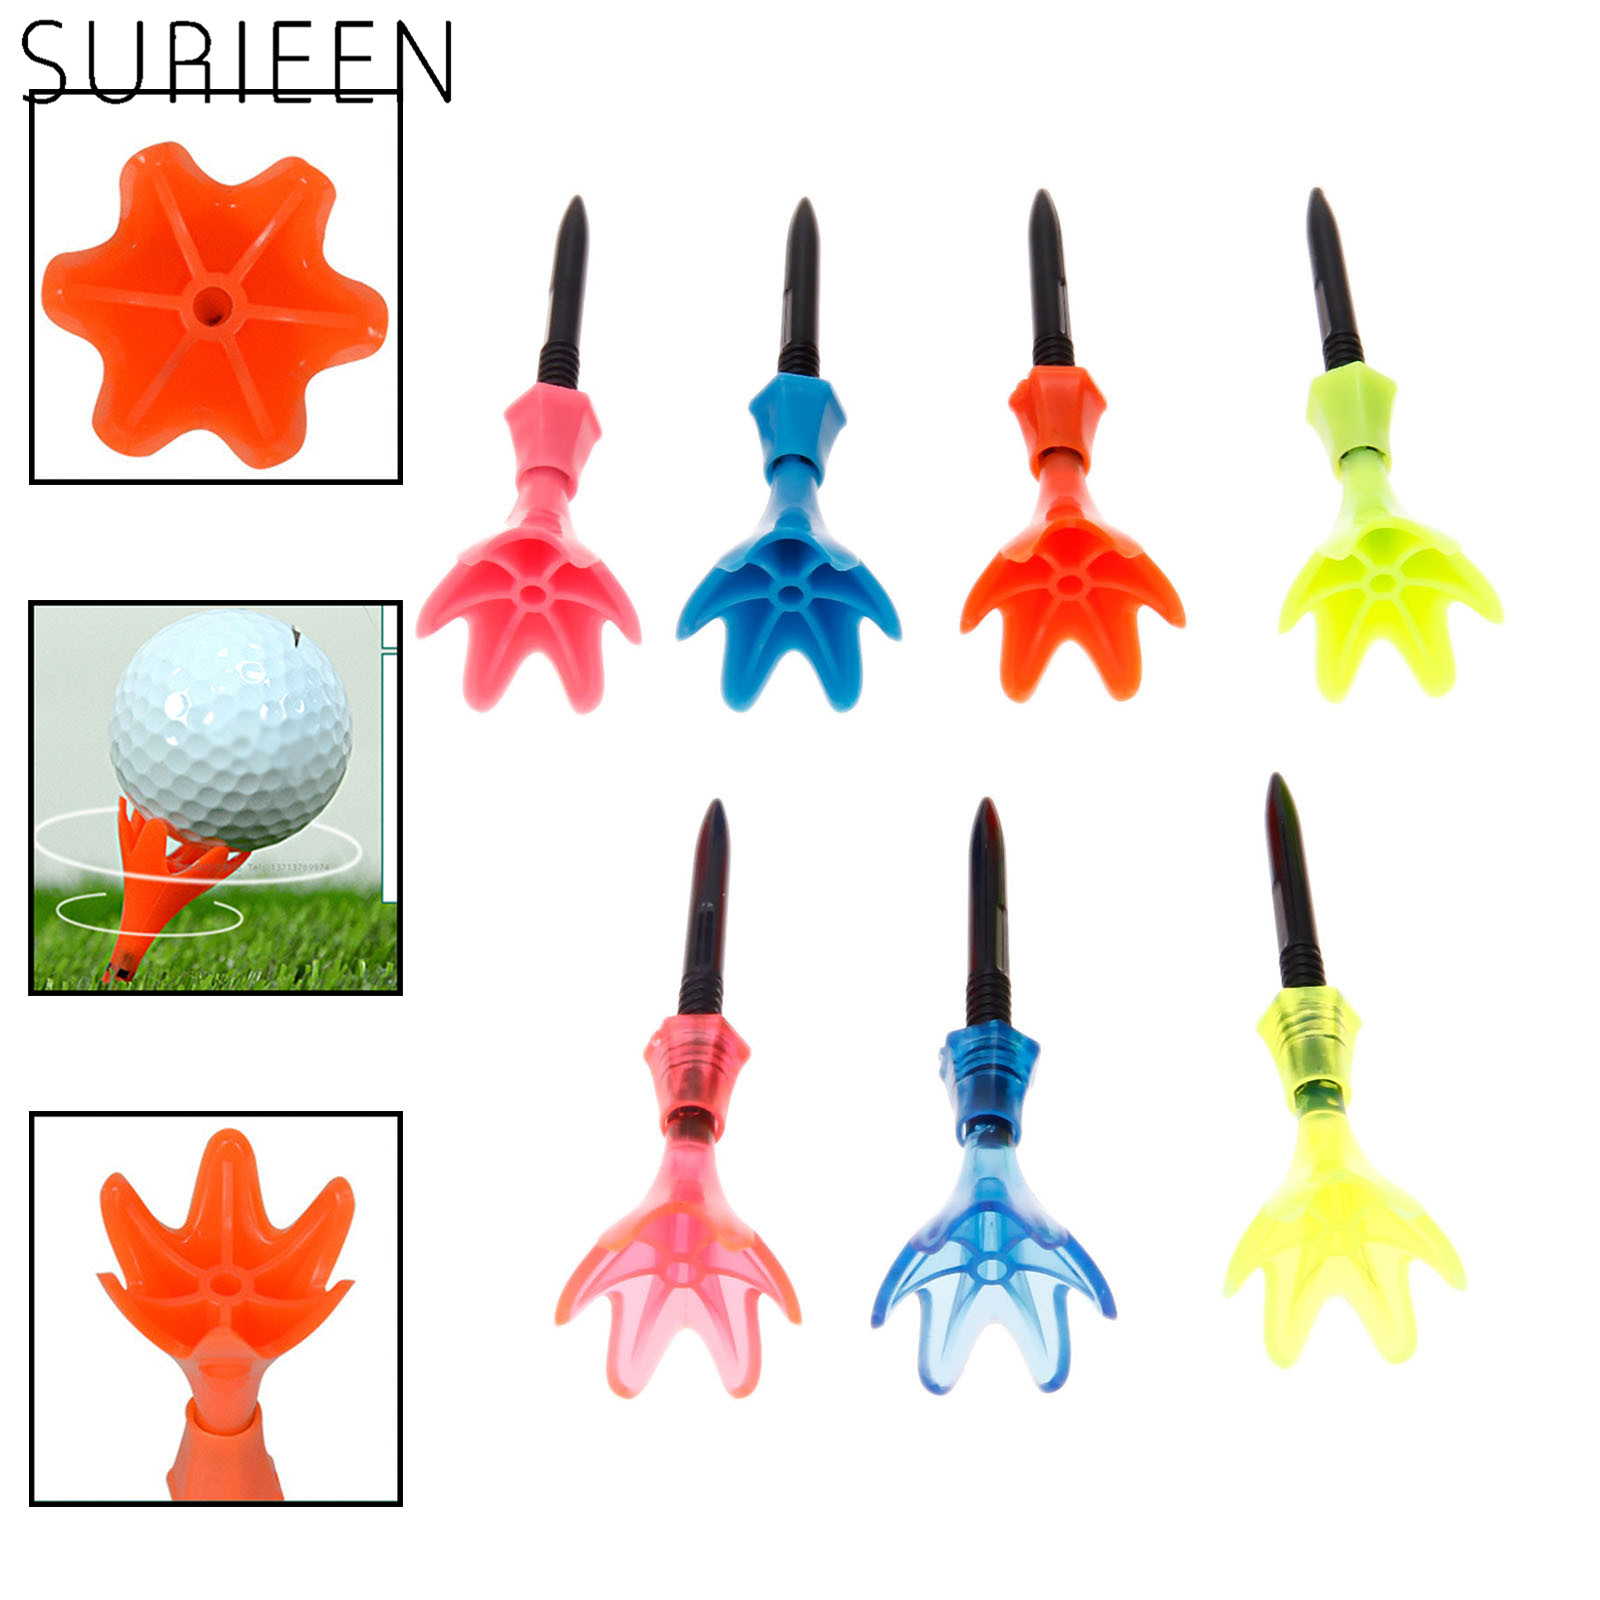 3 Pcs/Set Adjustable Height Golf Tee Plastic Rotatable Golf Ball Tees Rotational Limited Step Down Golfer Practice Equipments